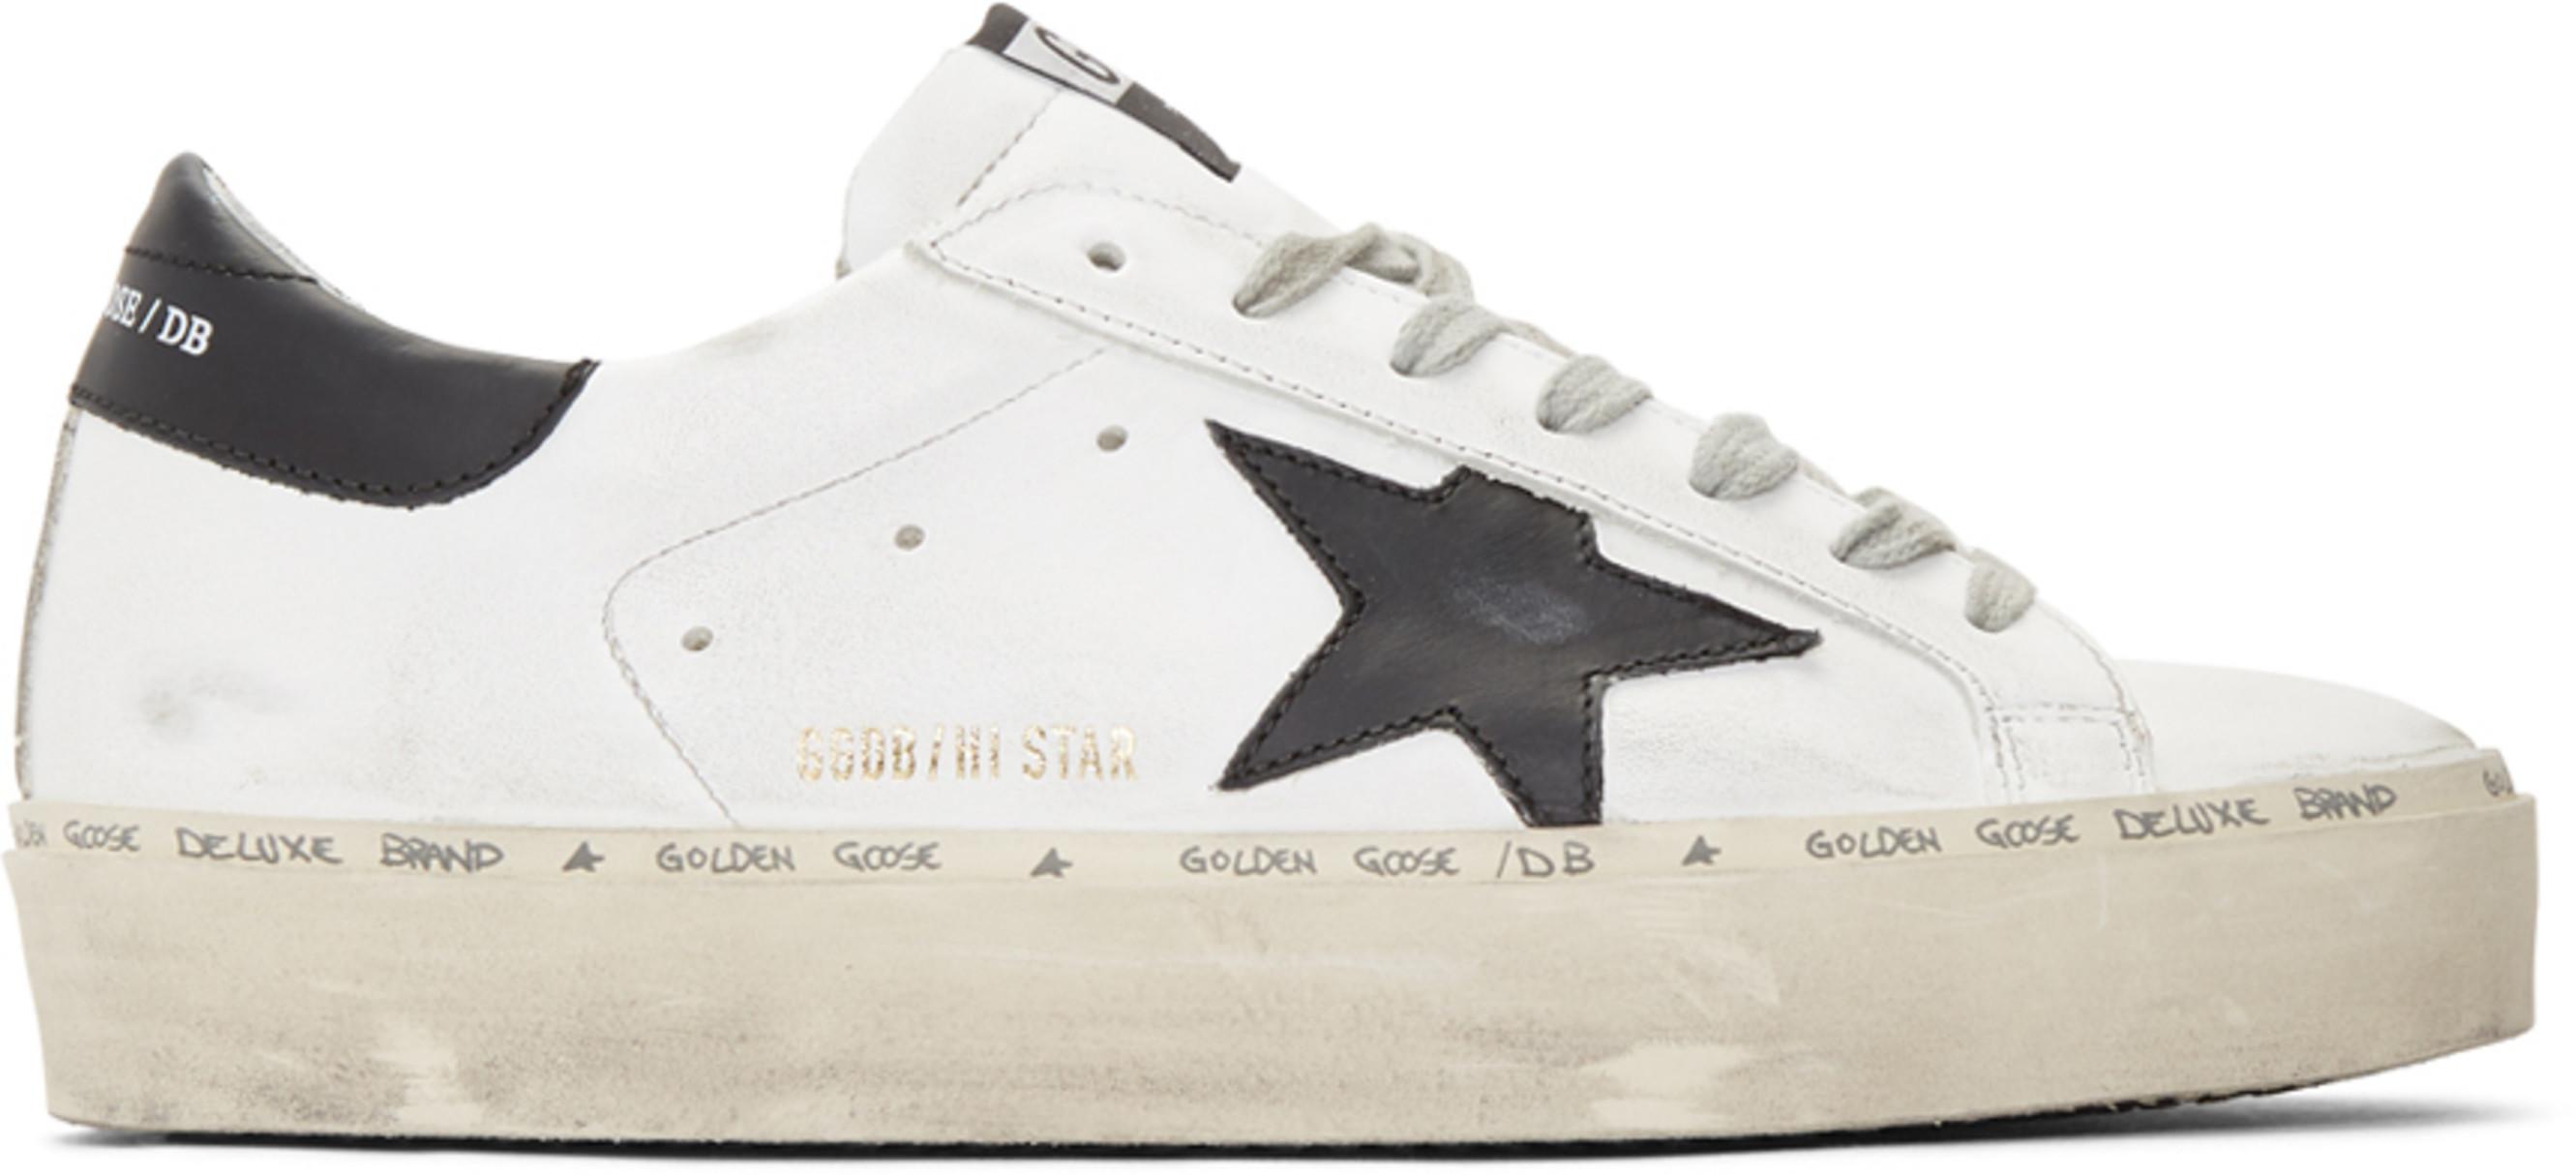 8c47a91ffc White & Black Hi Star Sneakers